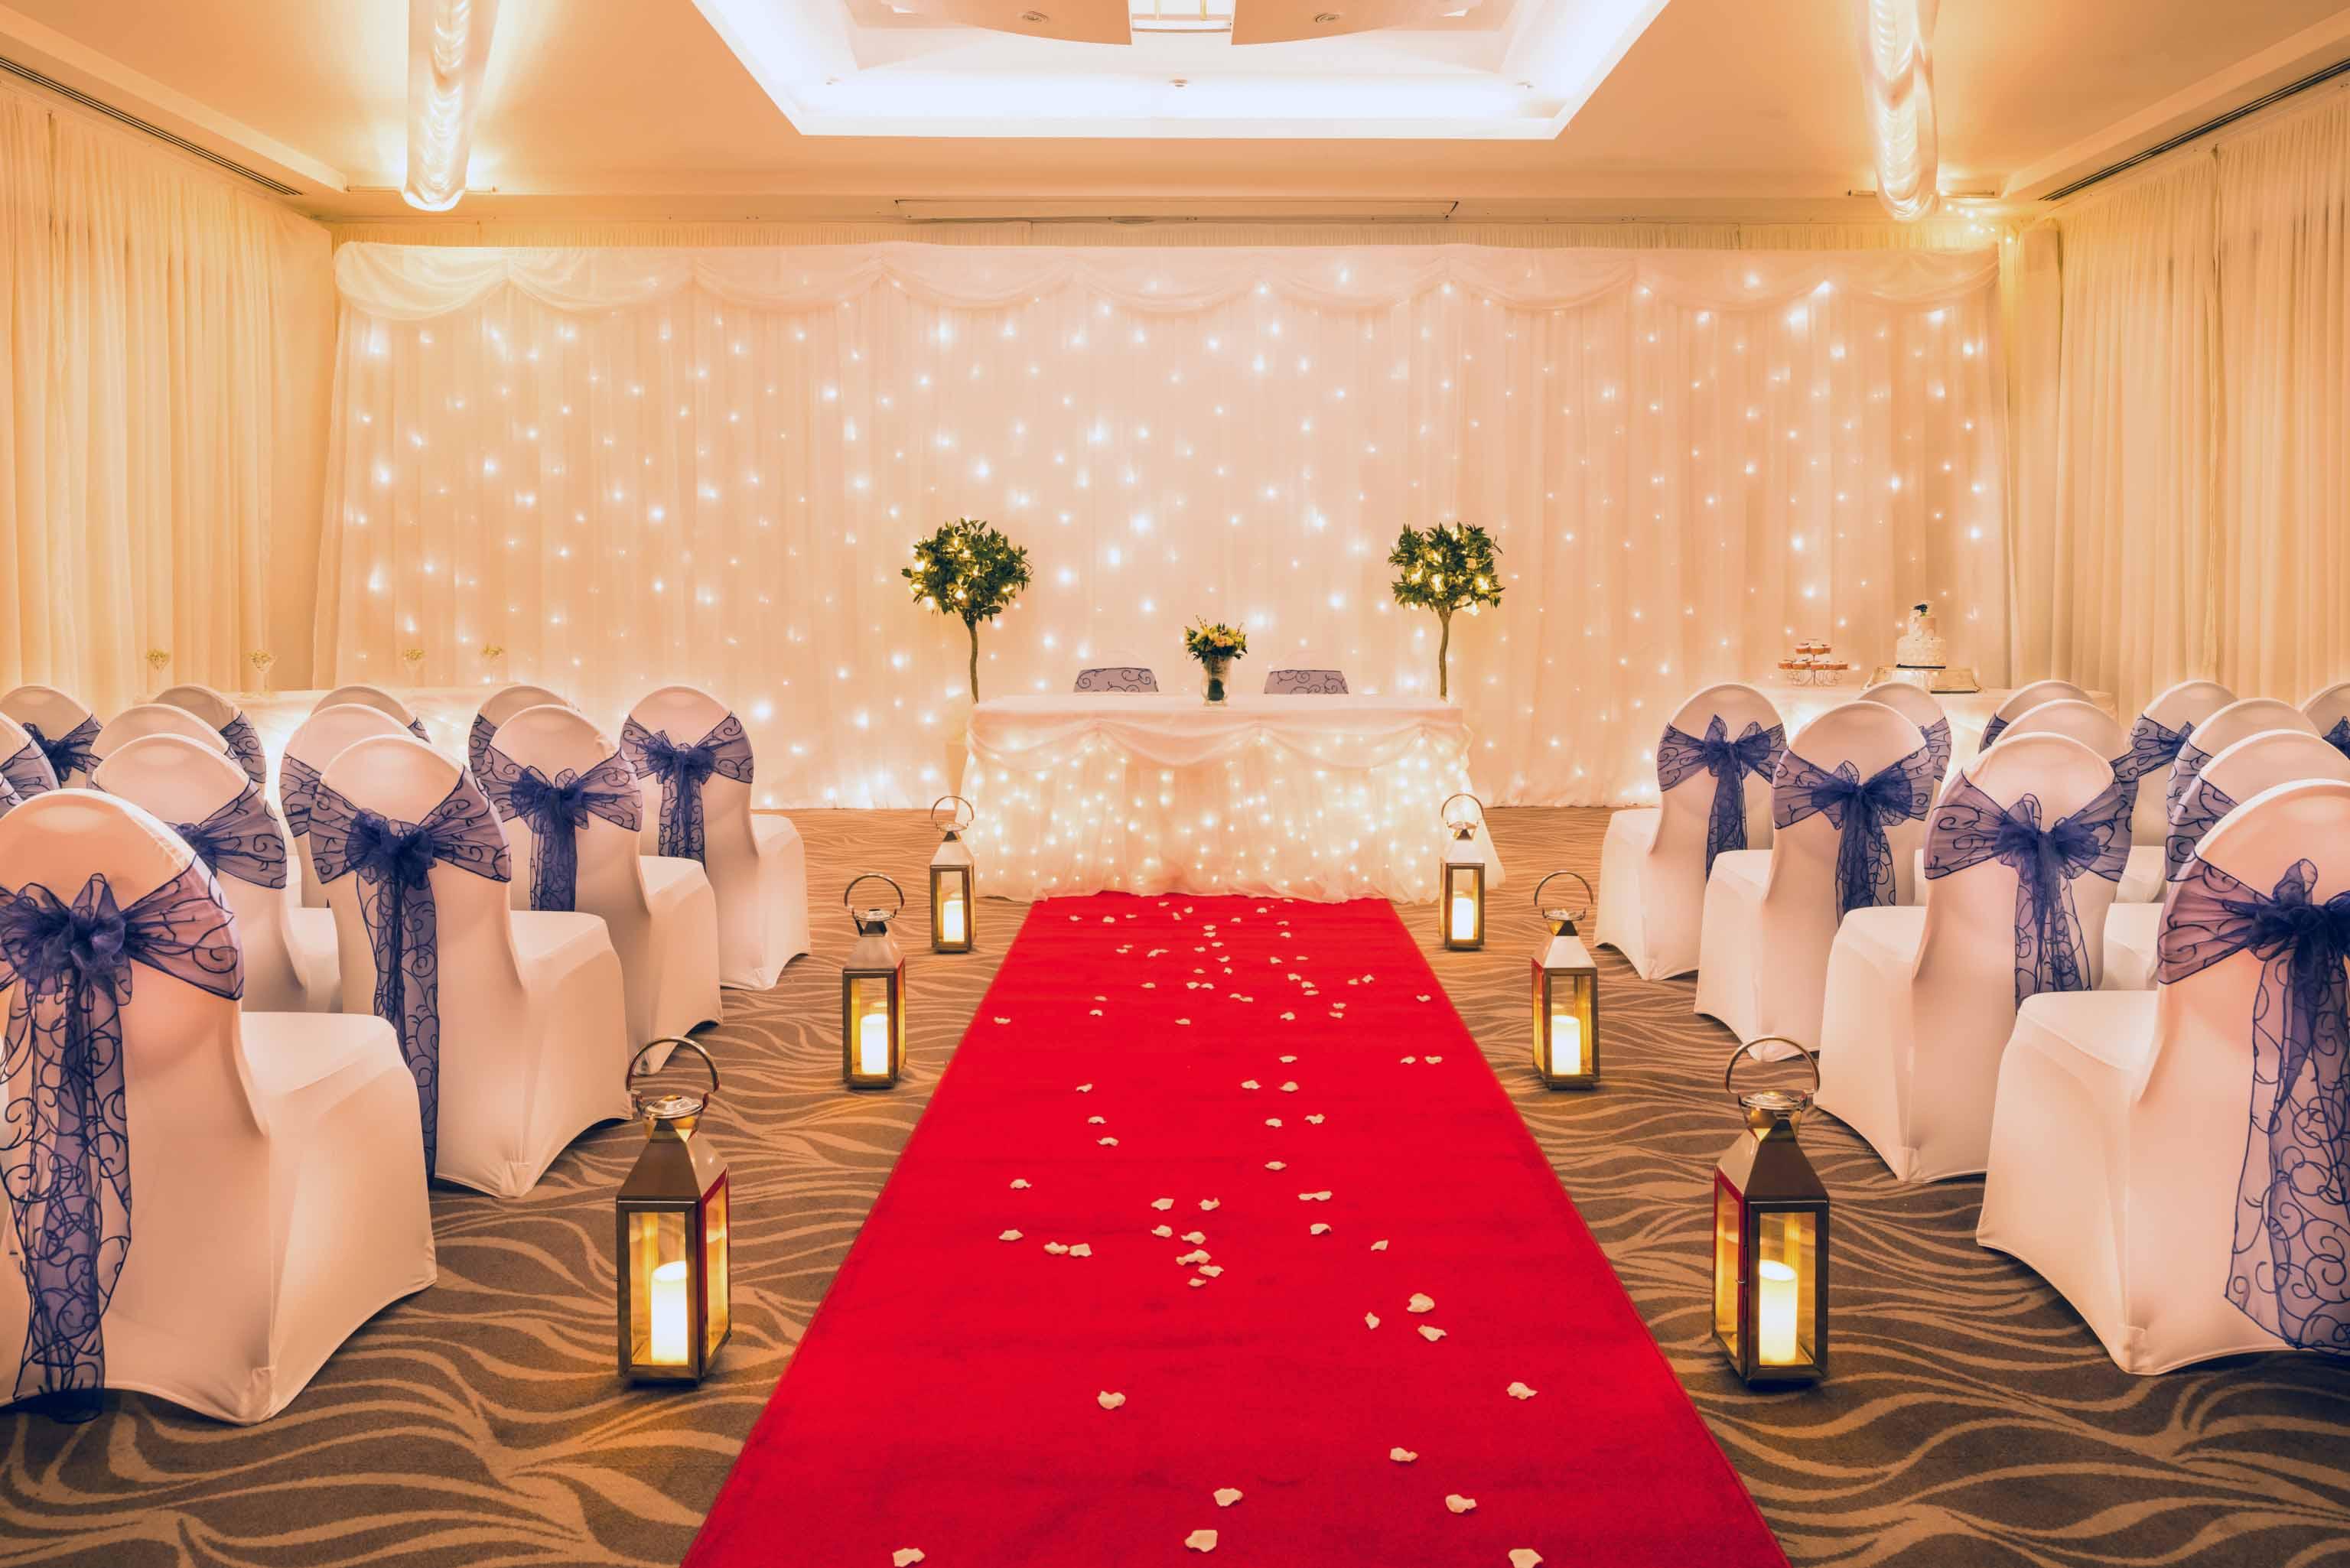 Wedding_Merry-Hill_285-Edit_newbolt_wedding_aisle_back